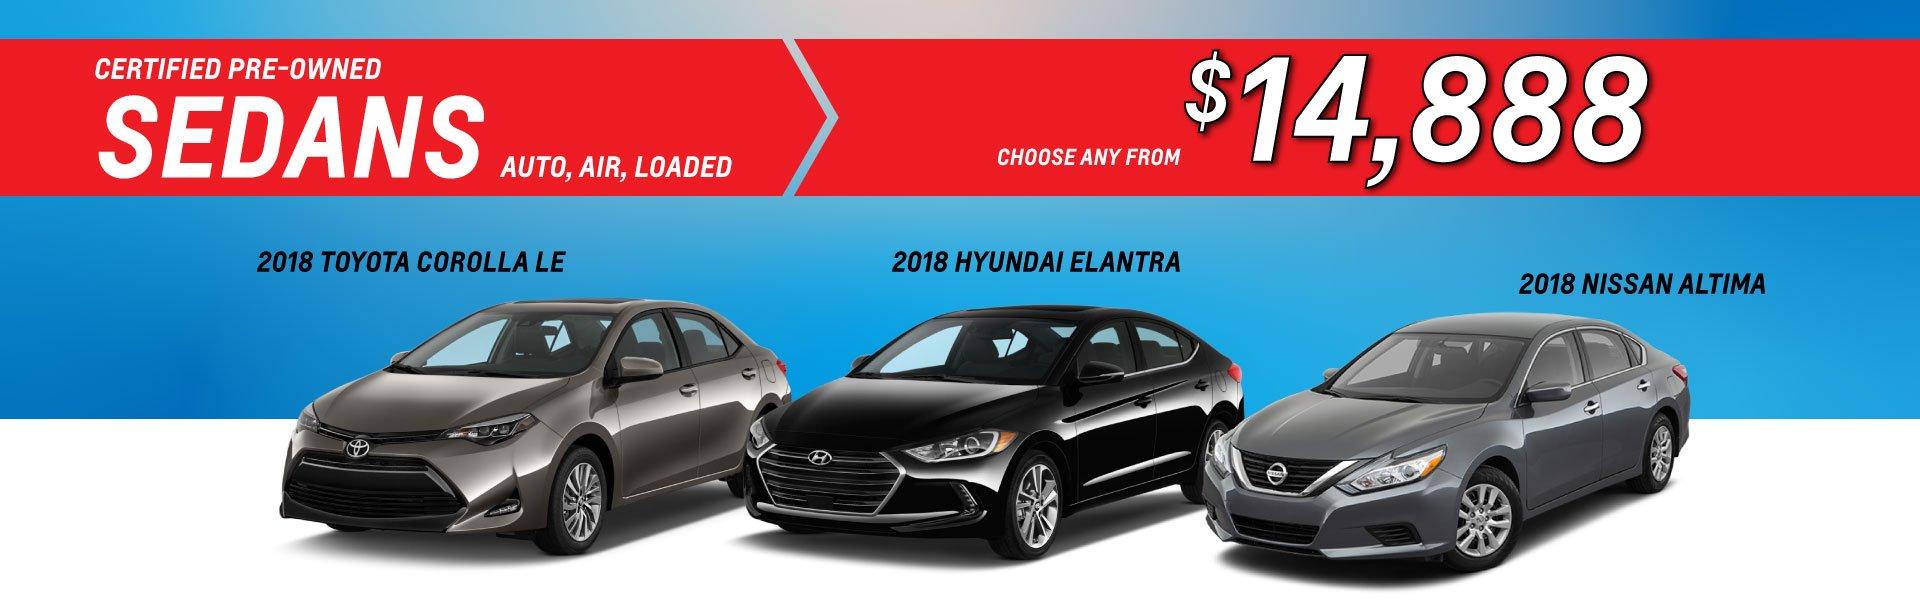 Used Sedans Cost Less at Eagle Ridge GM